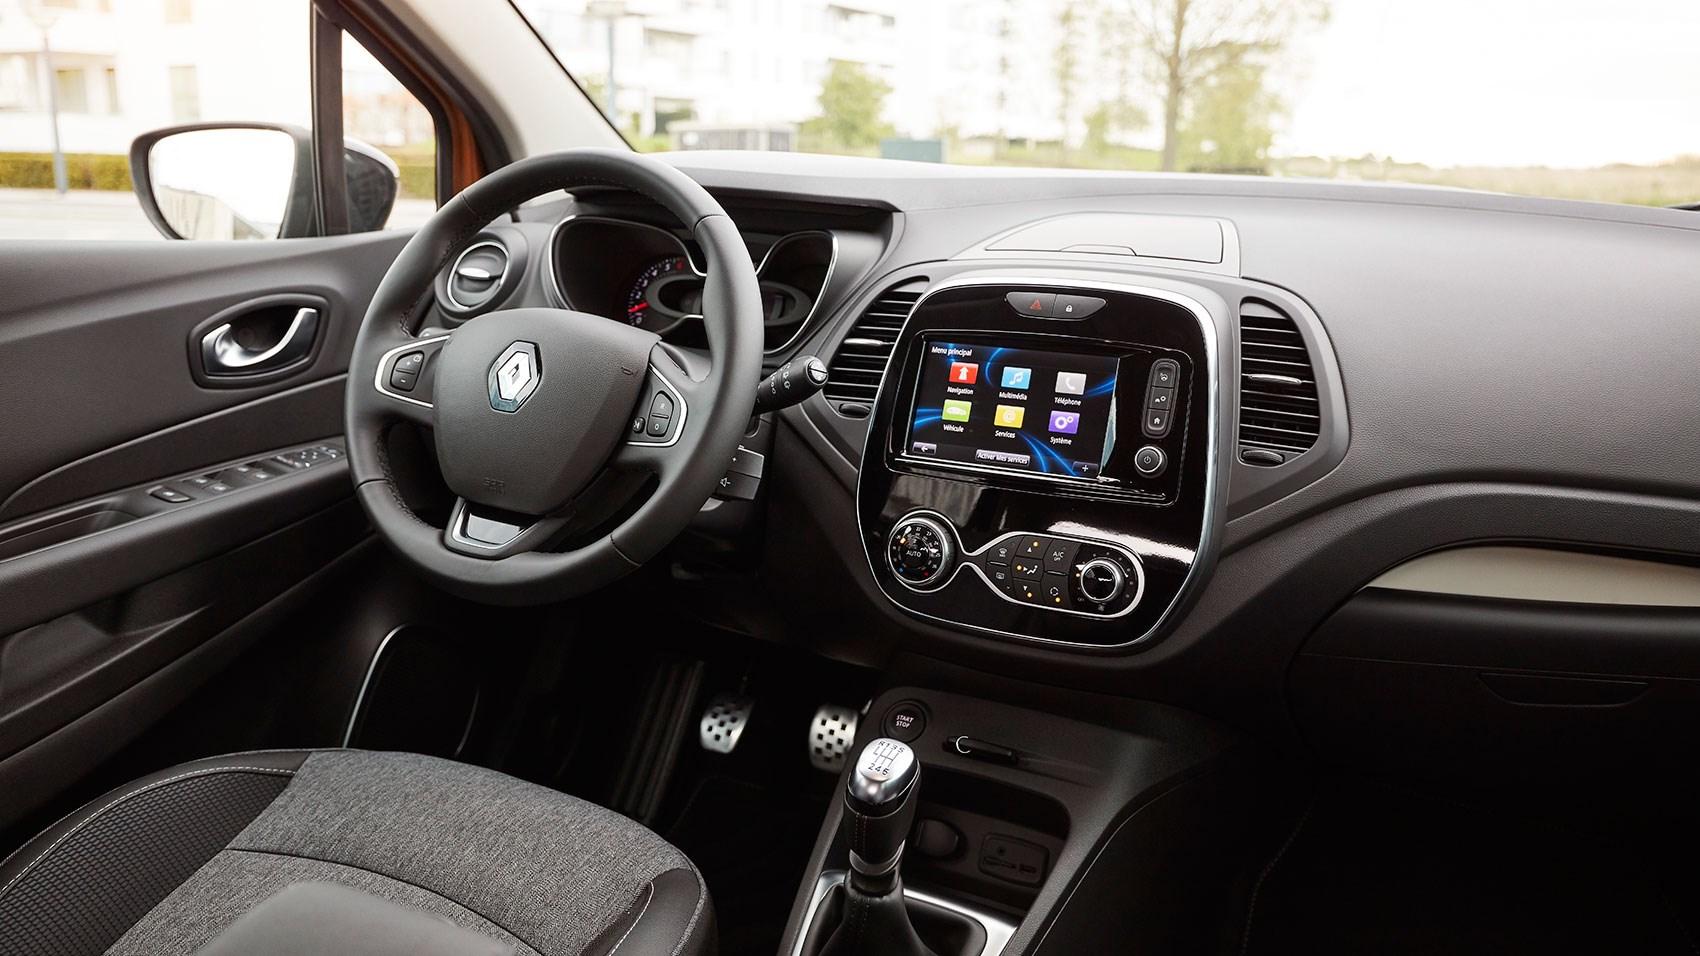 Renault Captur Signature S Nav TCe 120 (2017) review | CAR